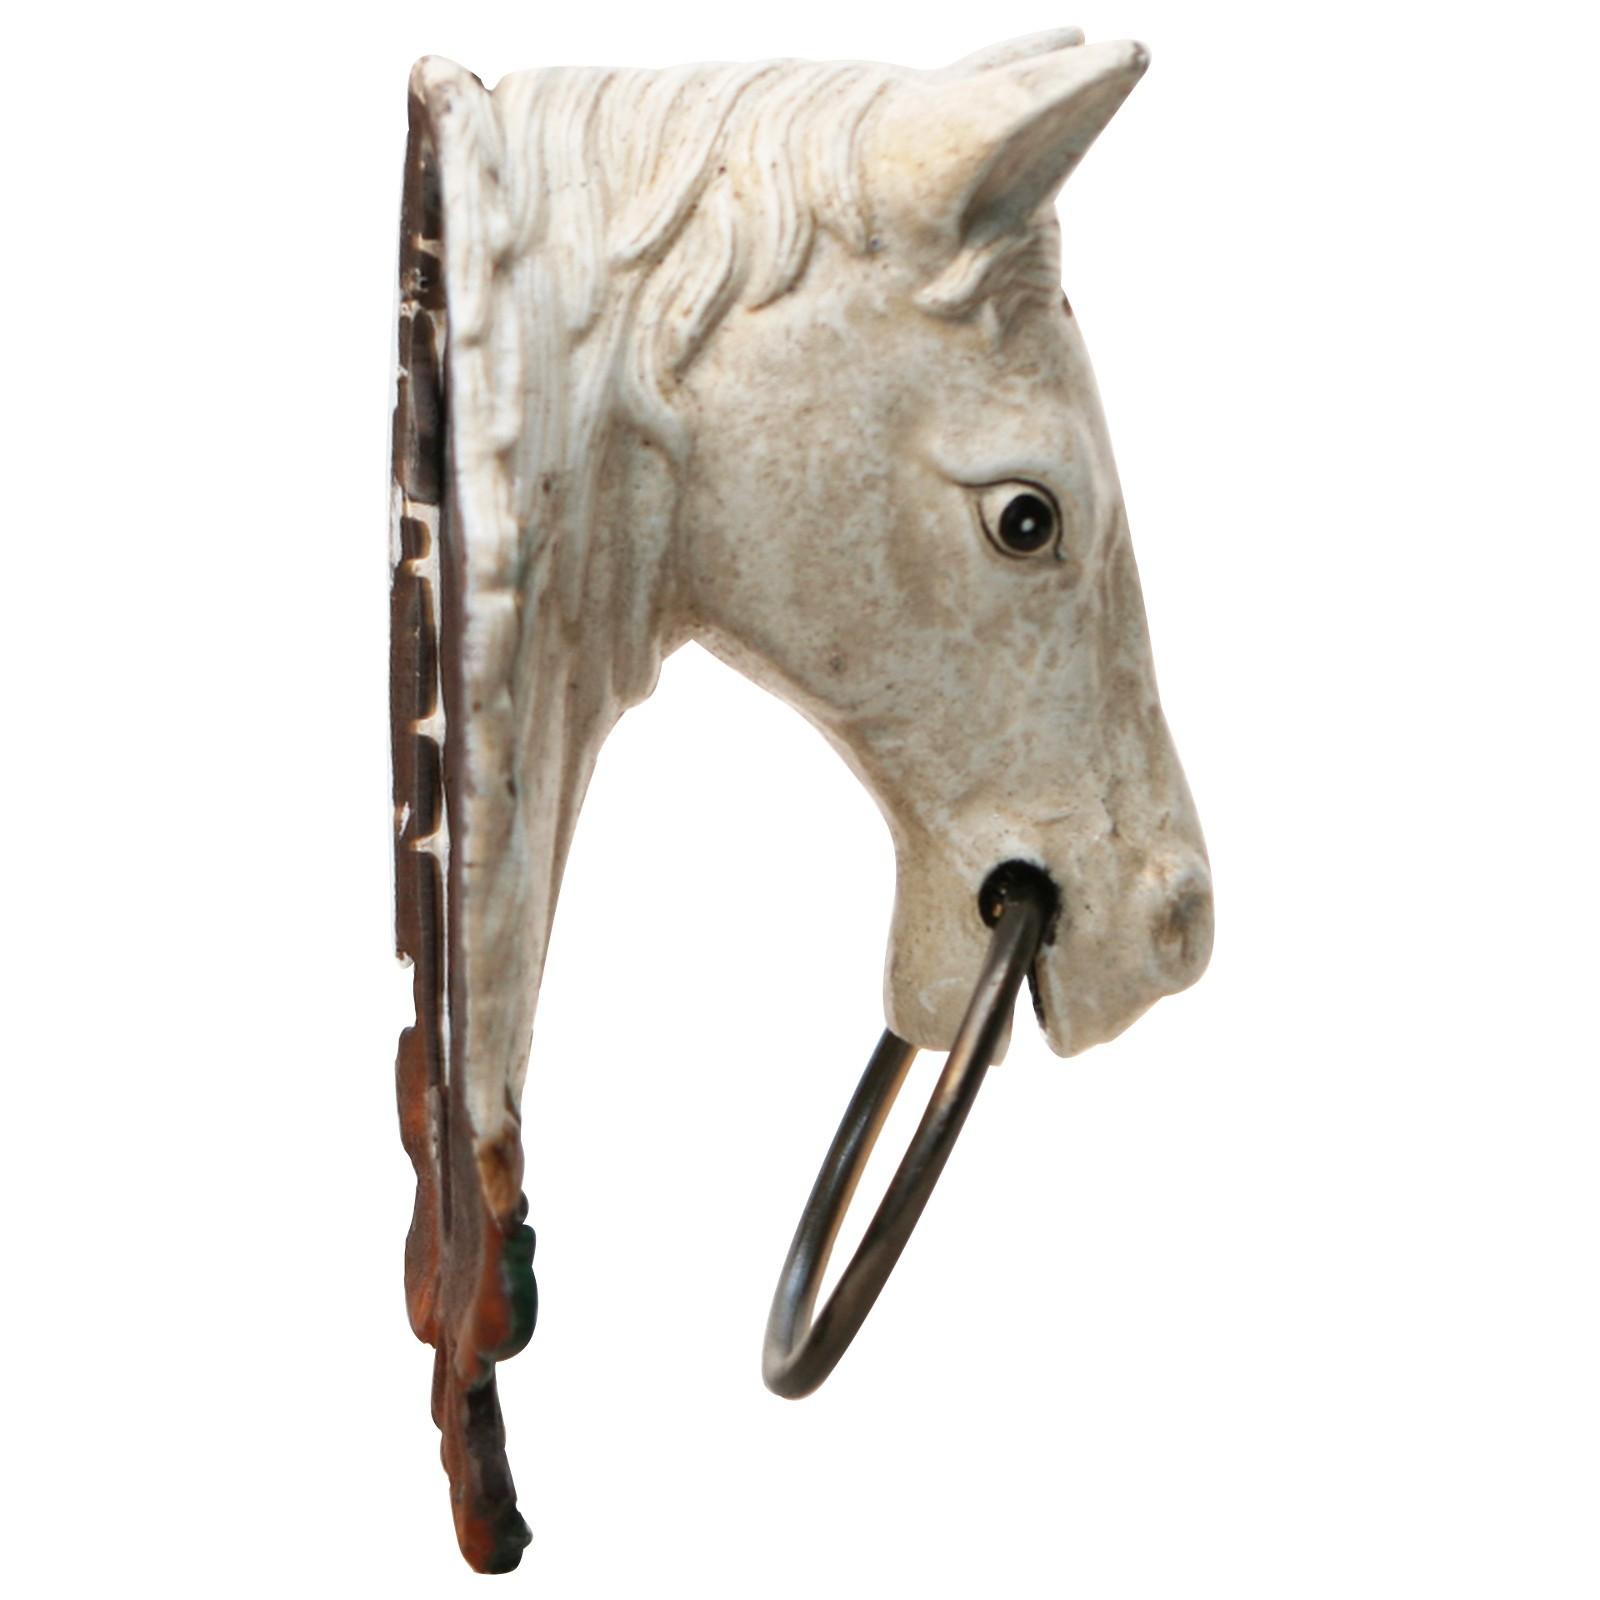 pferdekopf gusseisen schimmel pferd handtuchhalter pferdestall haus garten. Black Bedroom Furniture Sets. Home Design Ideas